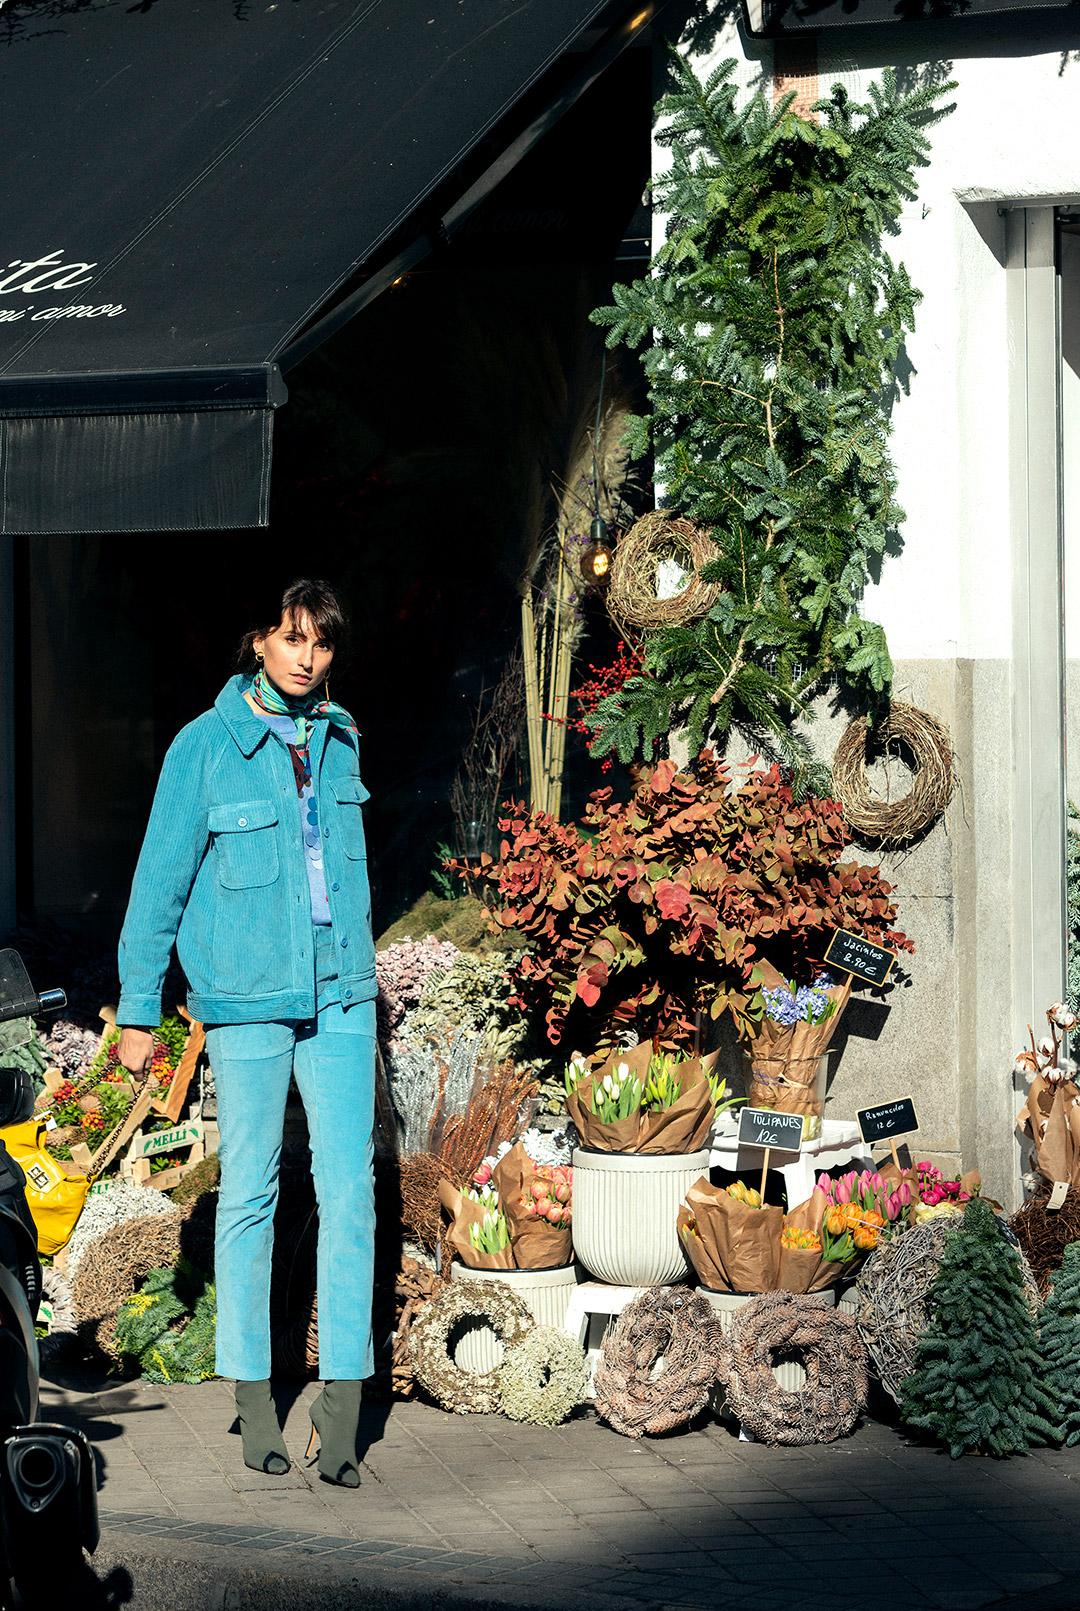 azul-streetstyle-mayte-de-la-iglesia-1080px-05